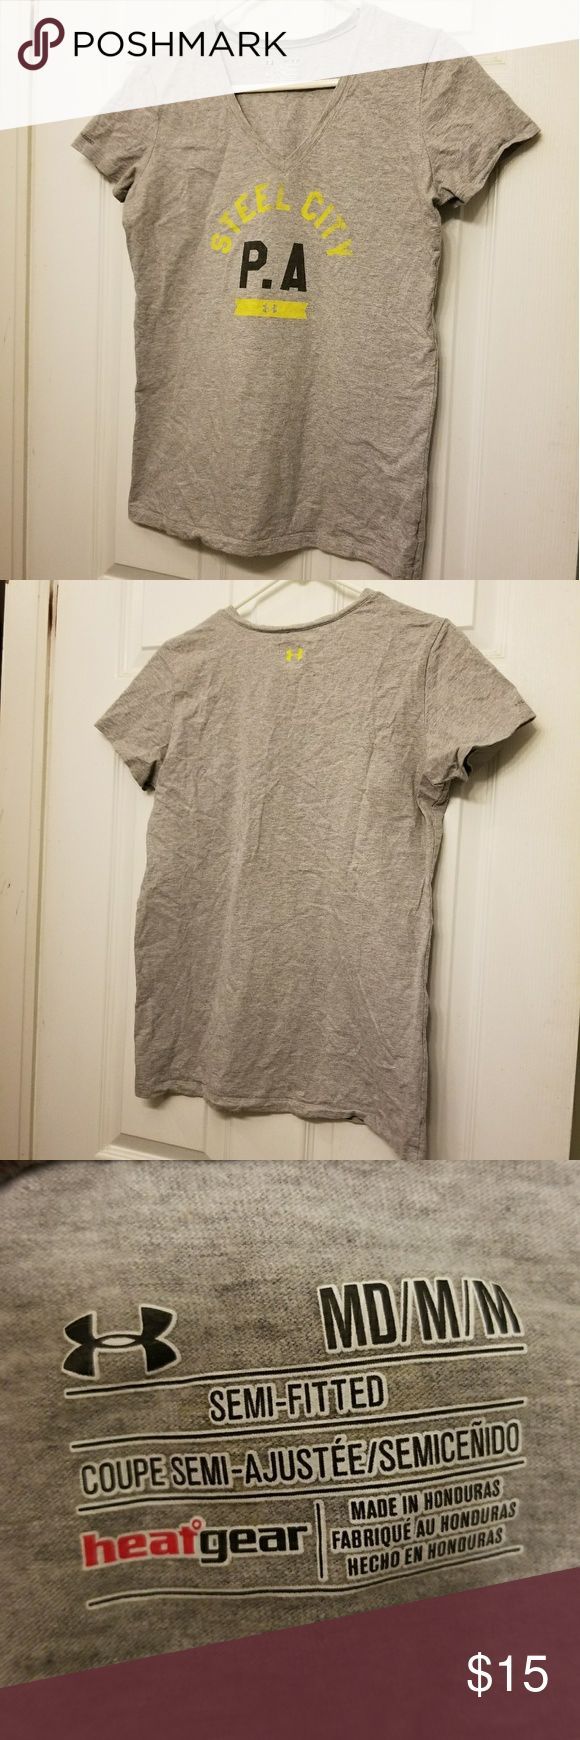 Under Armour Steelers t-shirt Women's v-neck t-shirt, Steelers. Size medium Under Armour Tops Tees - Short Sleeve